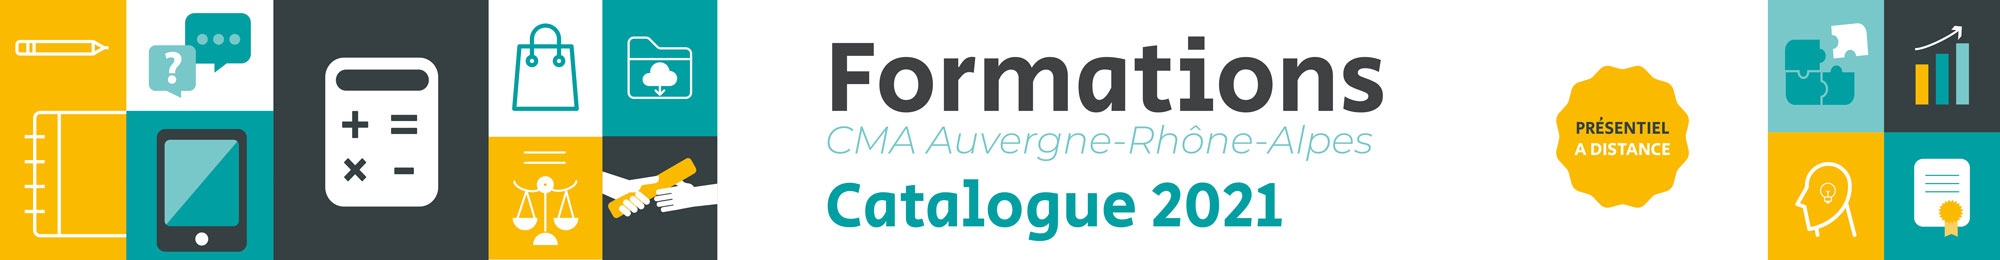 catalogue formations 2021 CMA Auvergne-Rhône-Alpes